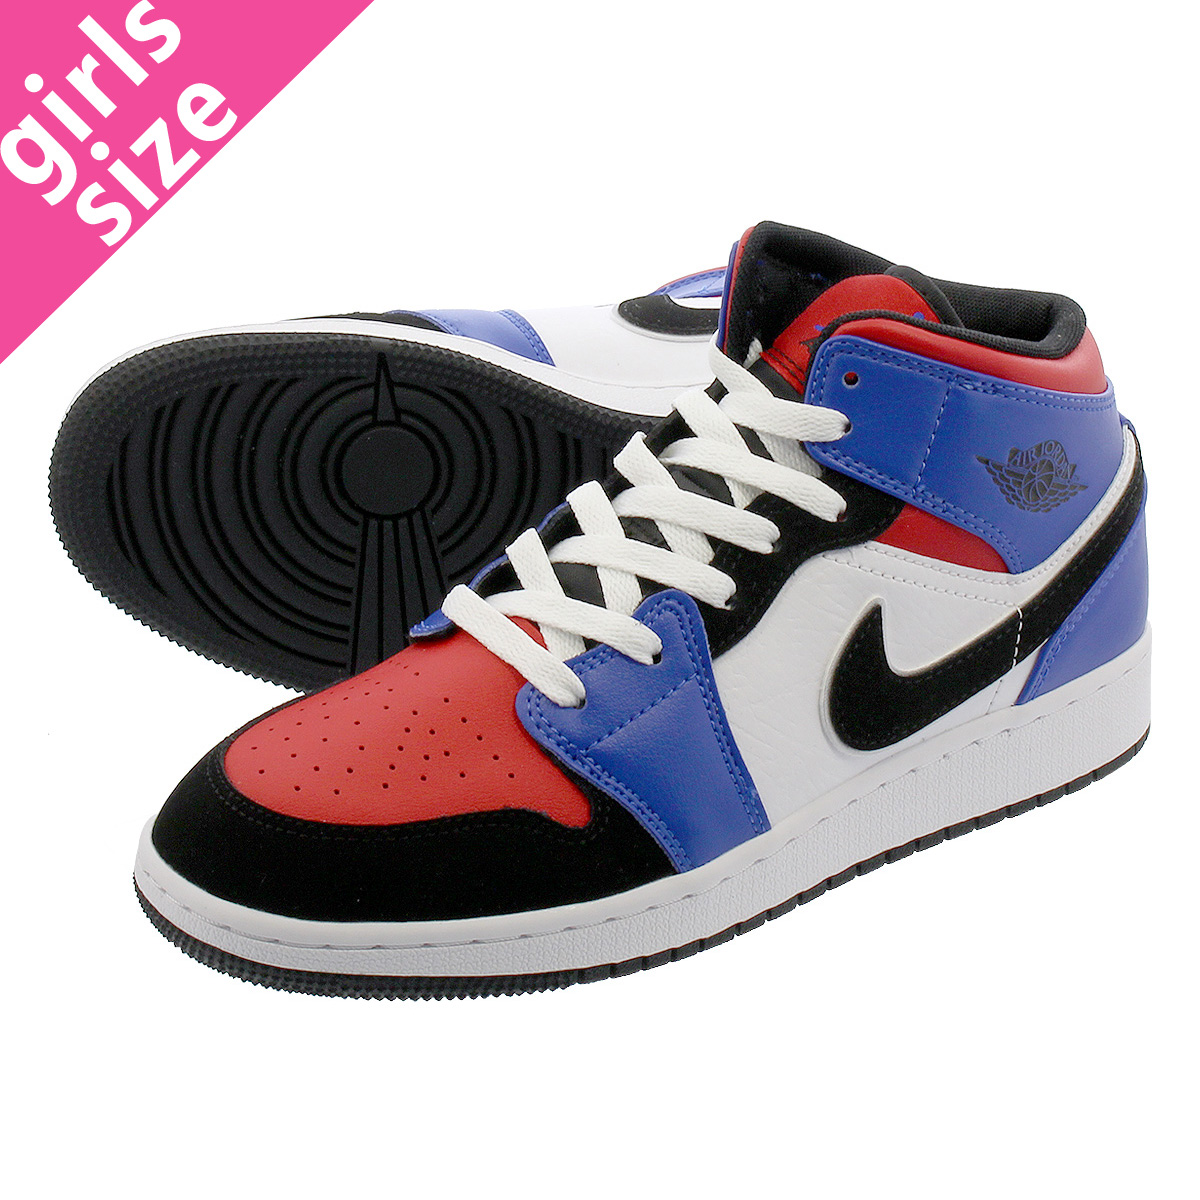 LOWTEX PLUS  NIKE AIR JORDAN 1 MID BG Nike Air Jordan 1 mid BG  WHITE BLACK HYPER ROYAL 554 4b83caa97